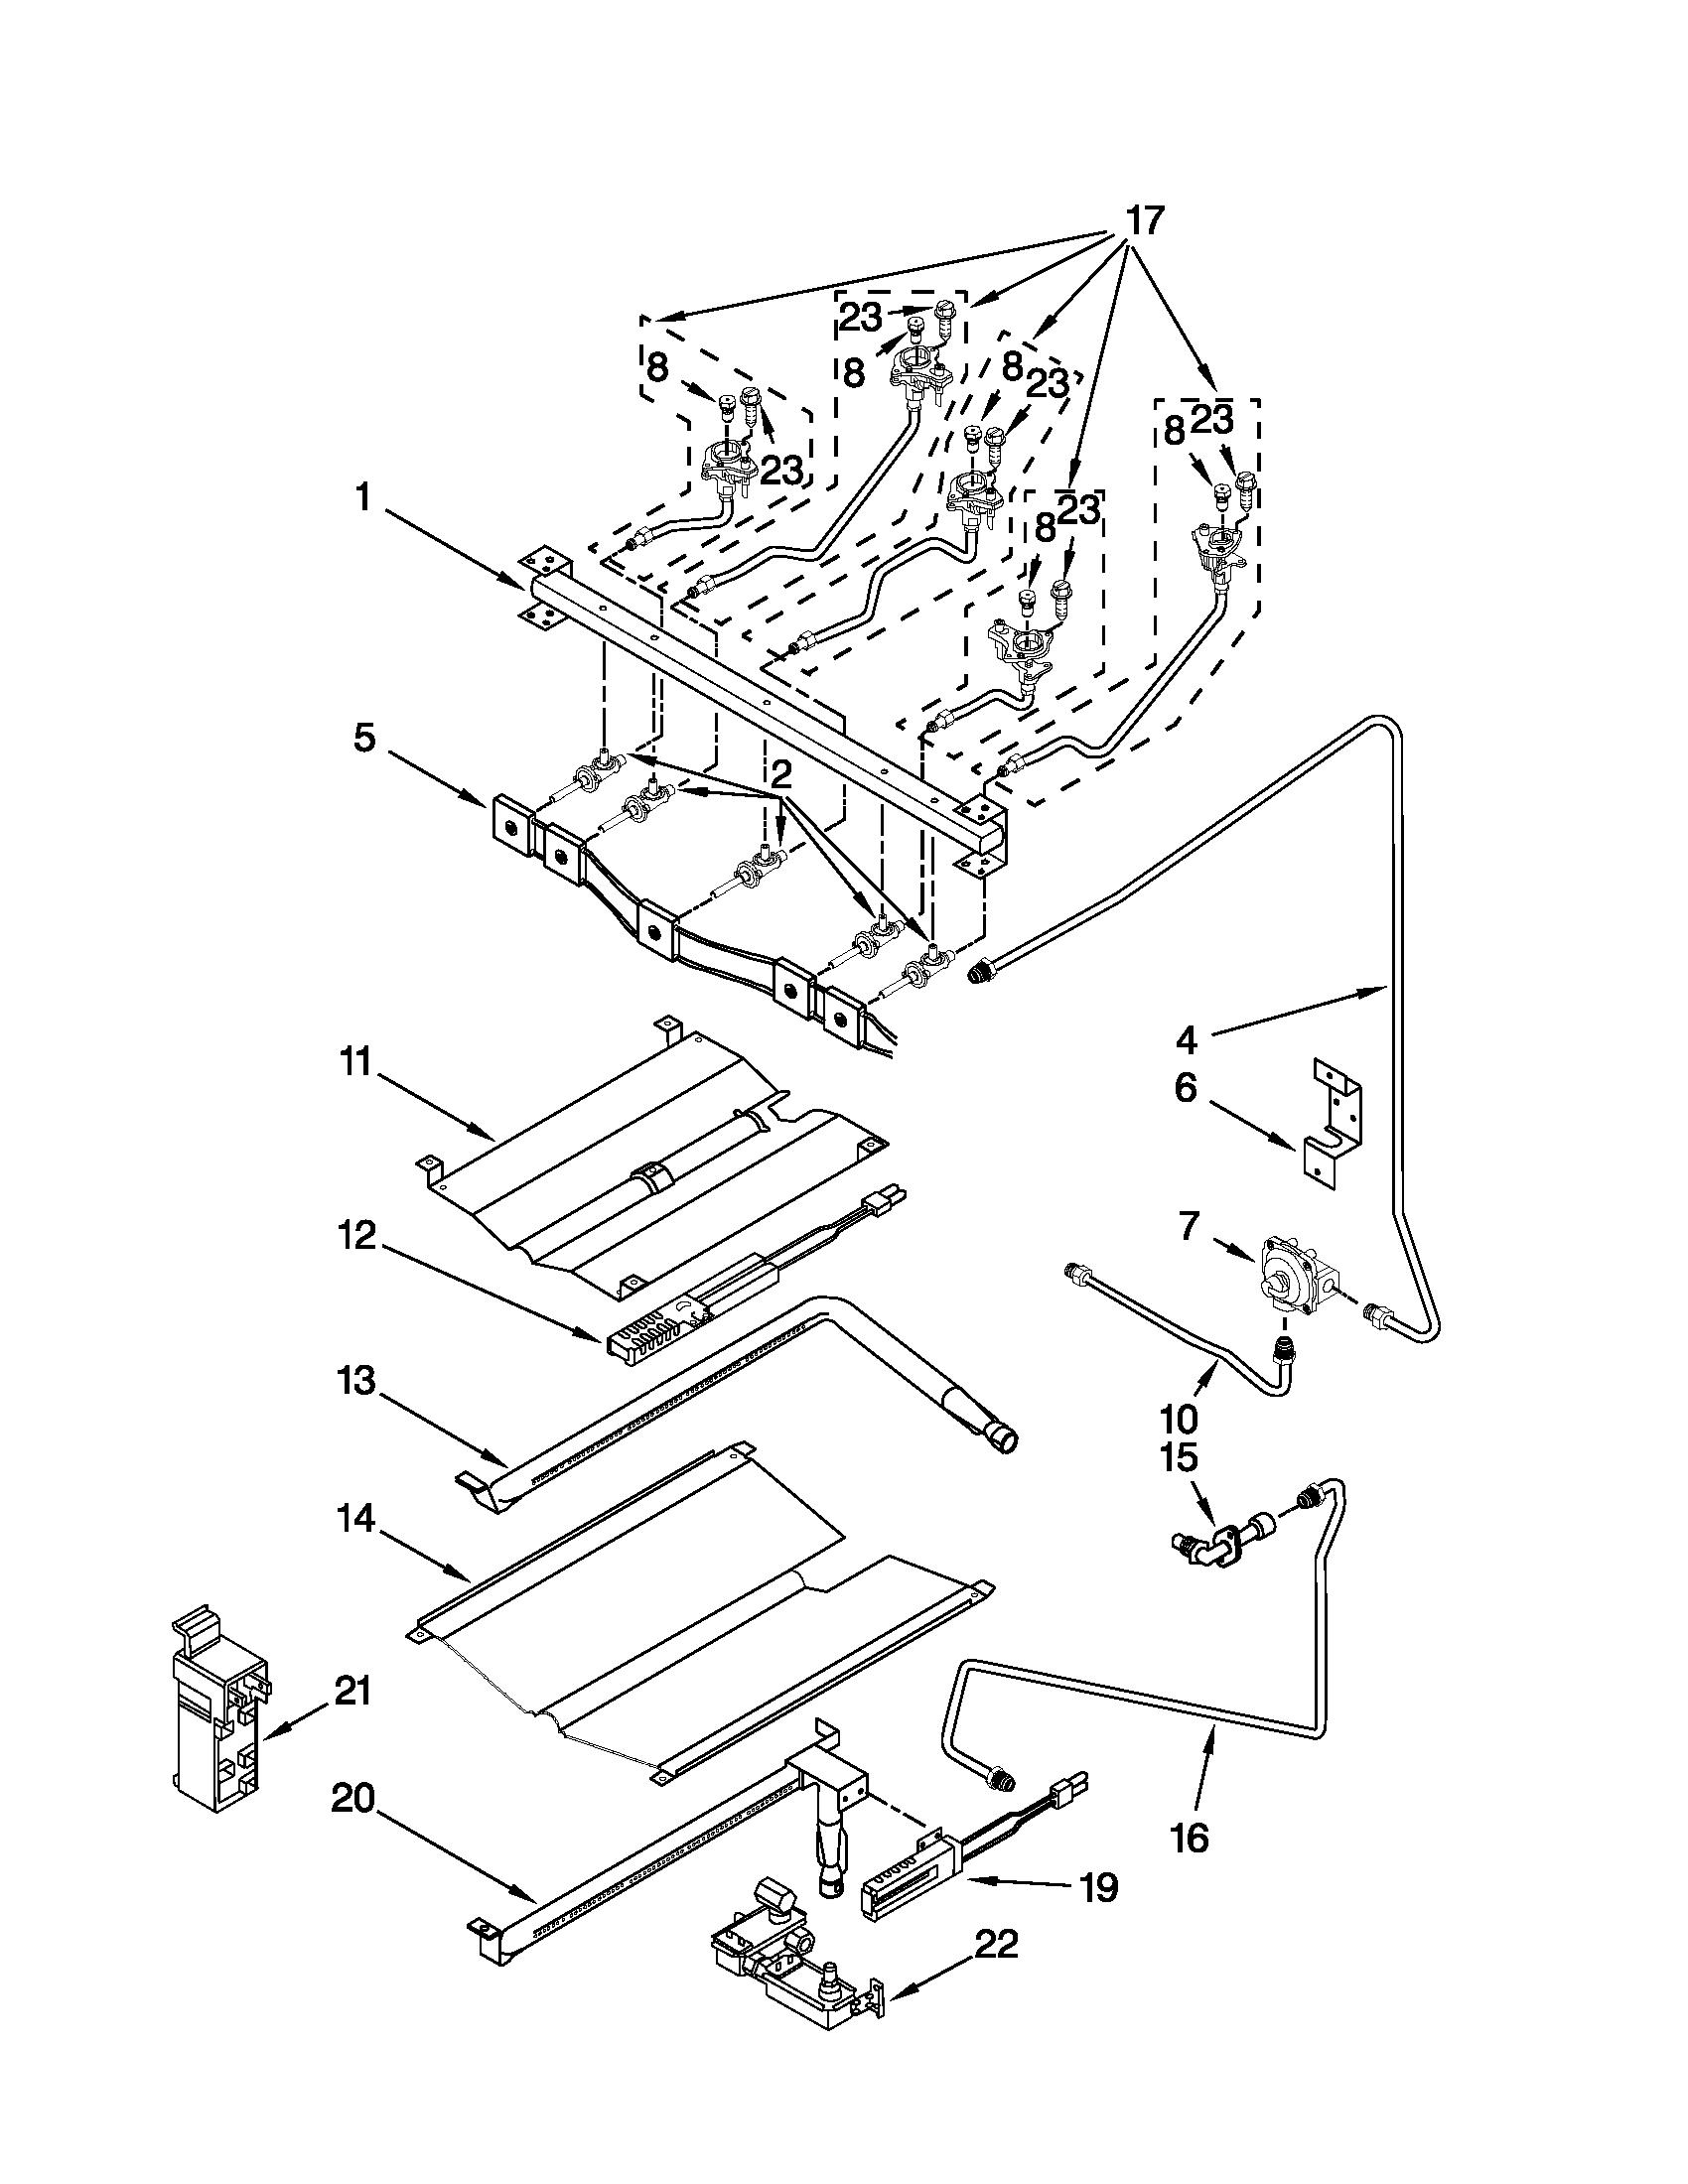 KitchenAid KGRS308XSS2 Range Manifold Wire-Harness